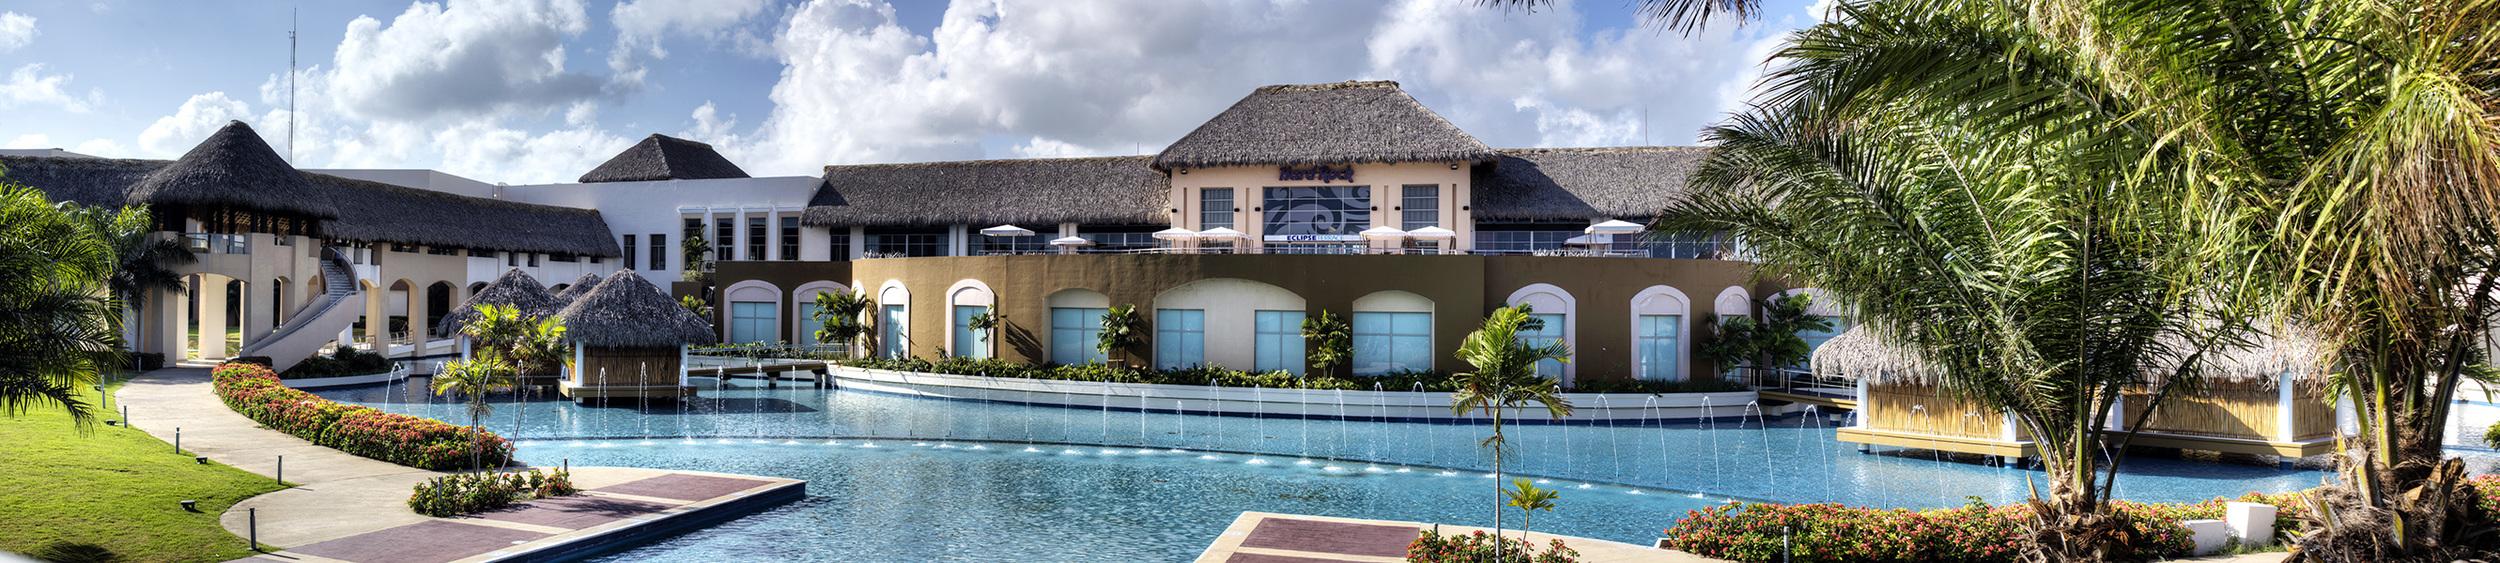 Hard Rock Resort Main Building - Punta Cana, DR